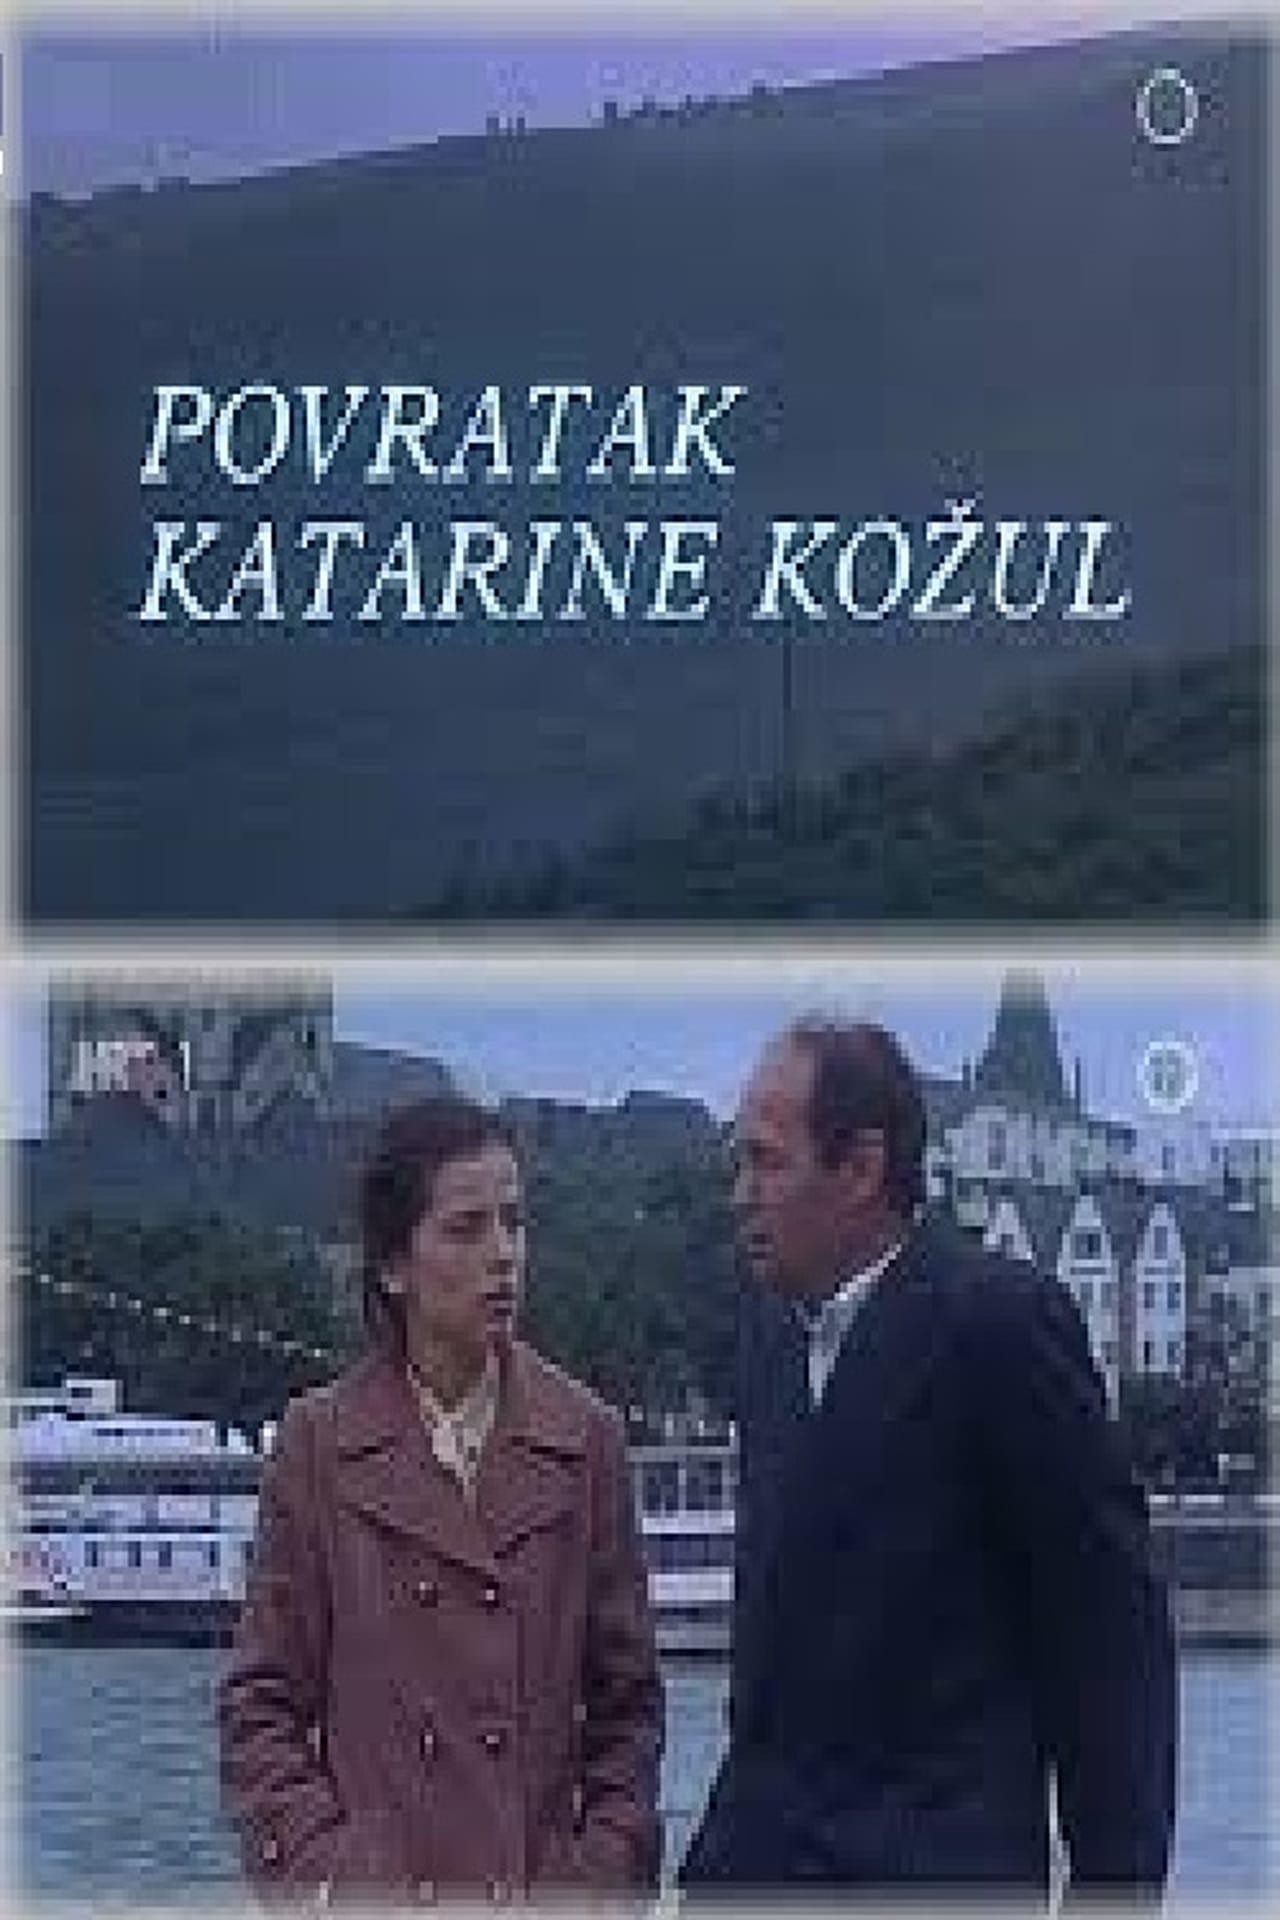 Return of Katarina Kozul